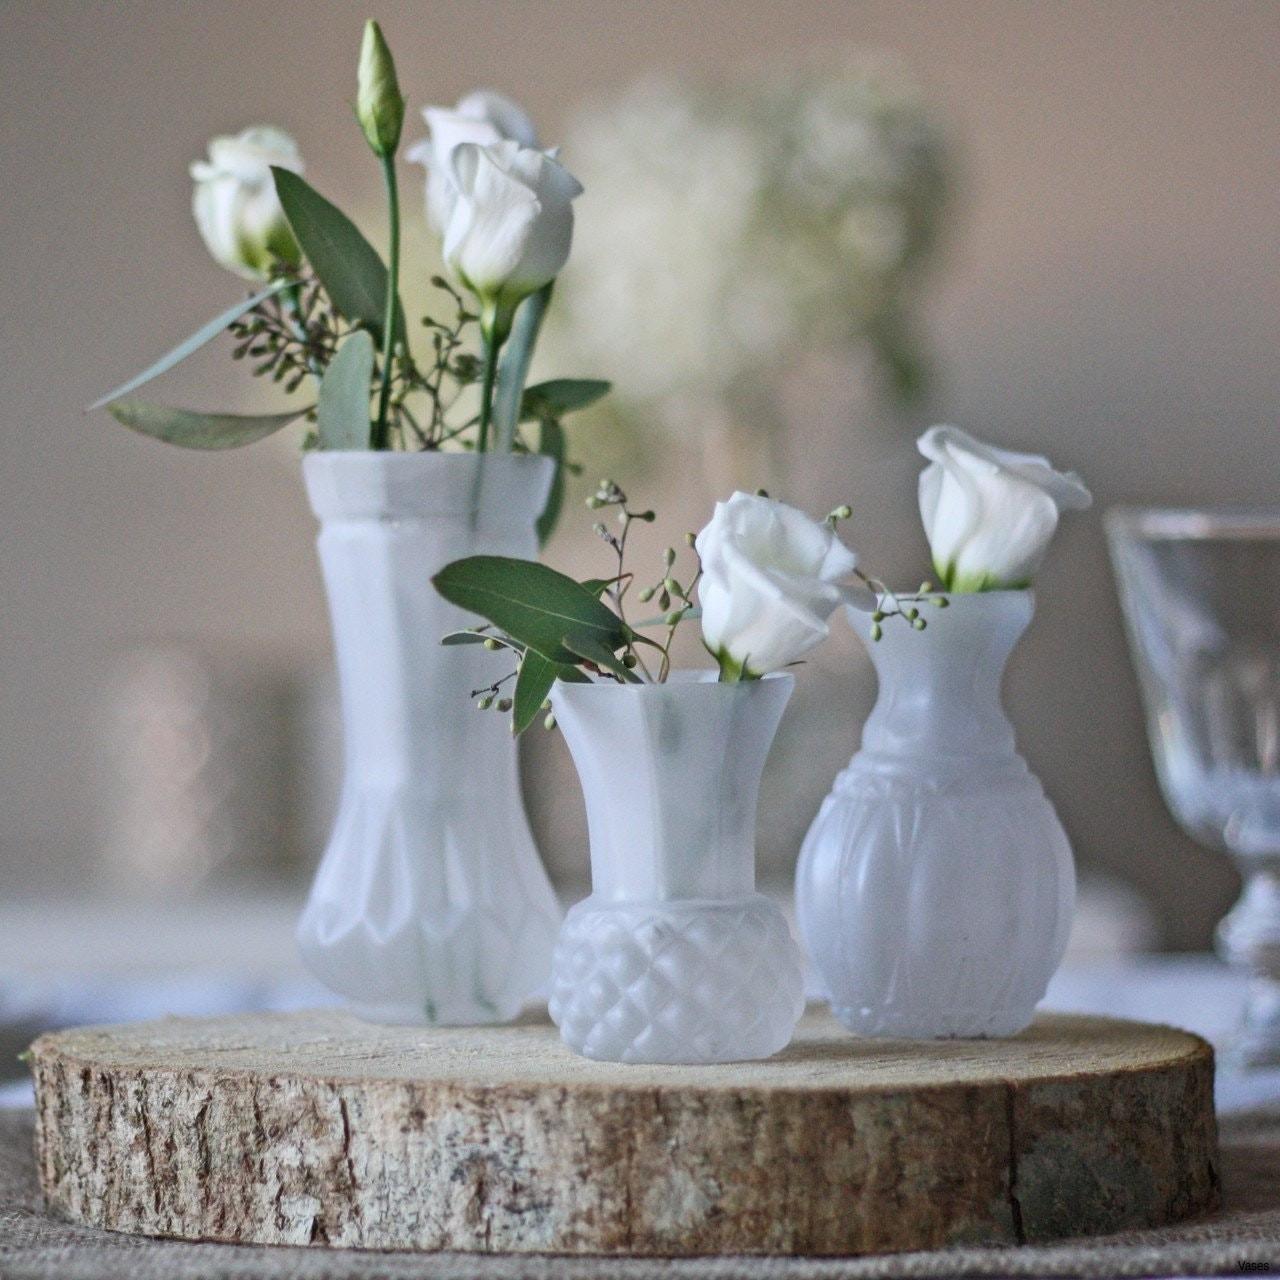 tall rectangular glass vase of 21 wedding table decorations tall vases italib net in wedding table decorations tall vases lovely jar flower 1h vases bud wedding vase centerpiece idea i